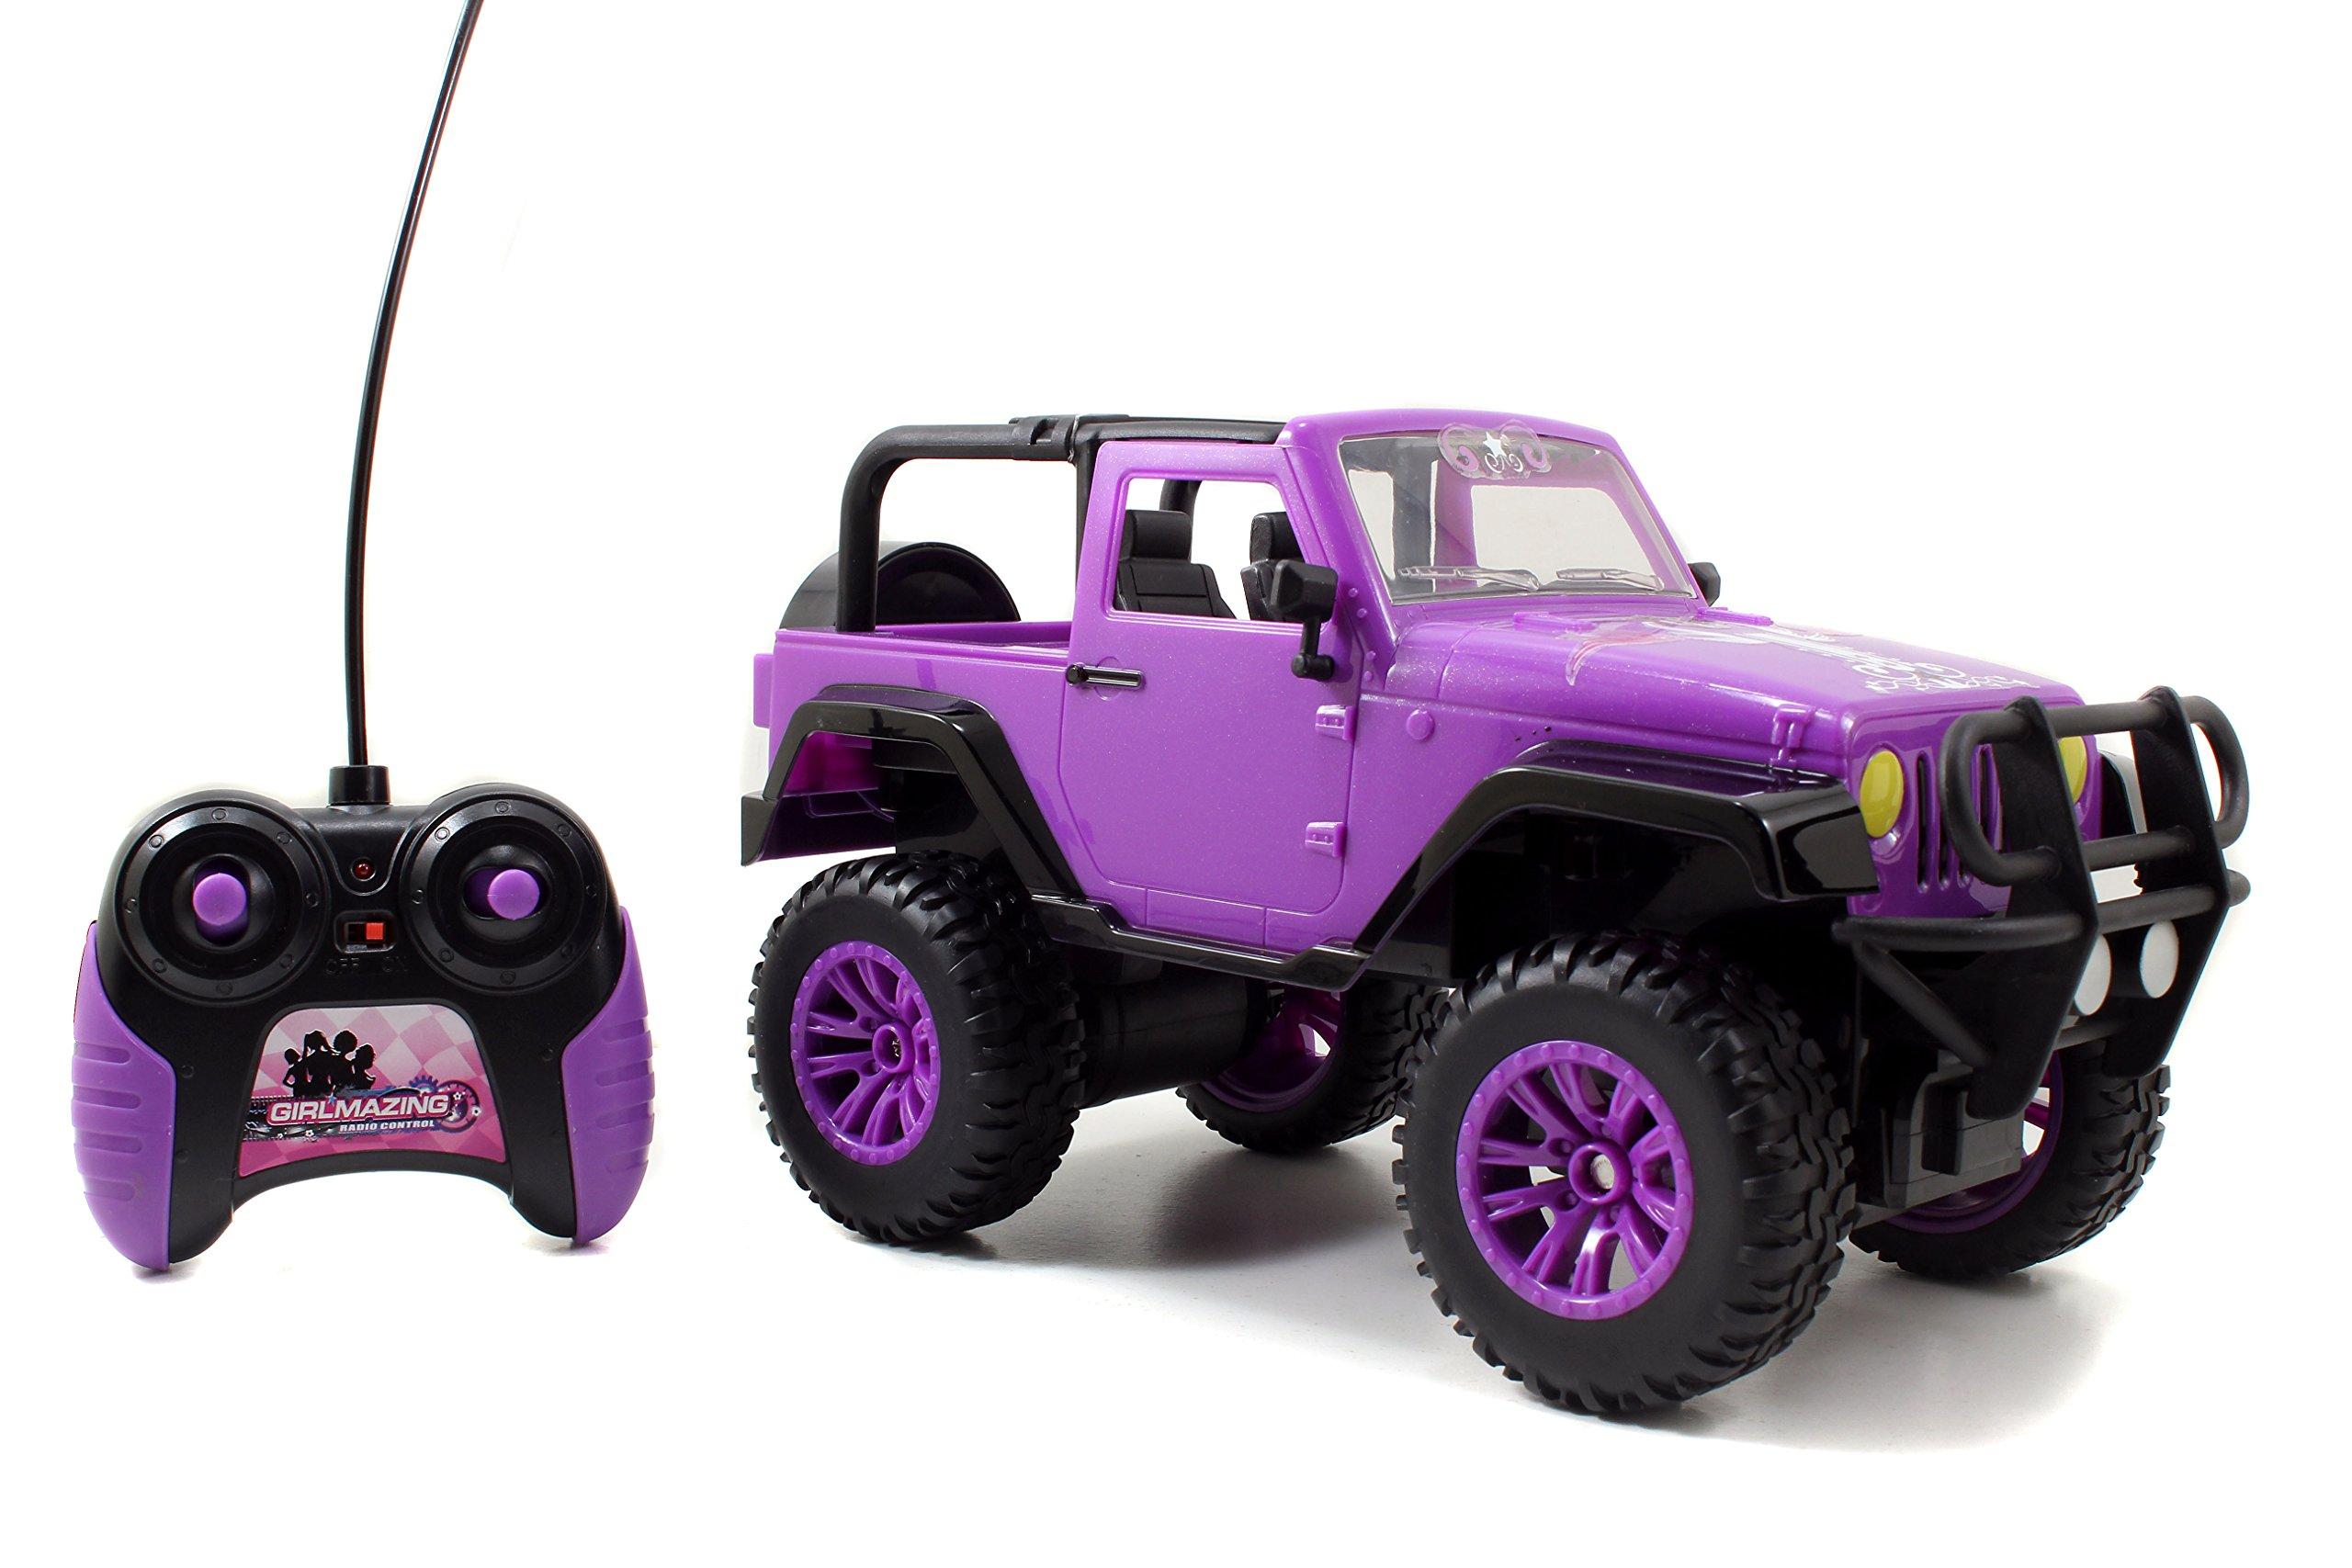 Jada Toys GIRLMAZING Big Foot Jeep R/C Vehicle (1:16 Scale), Purple by Jada